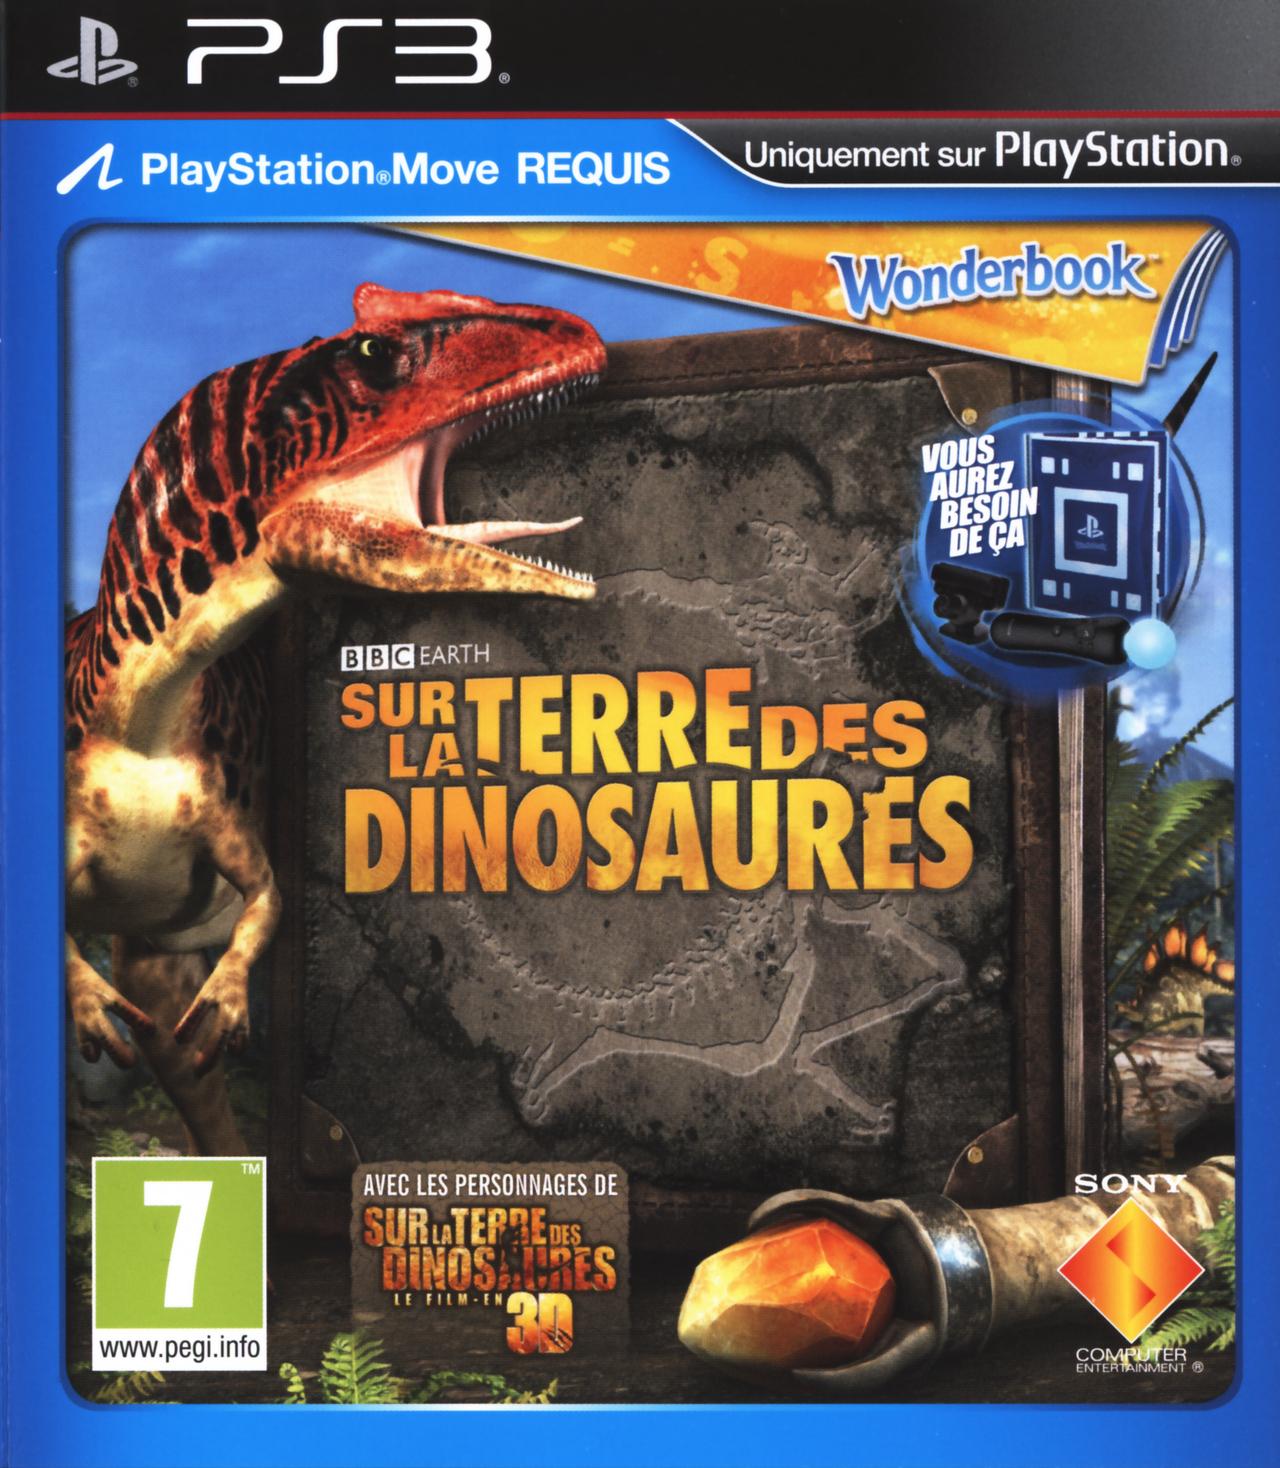 wonderbook sur la terre des dinosaures sur playstation 3. Black Bedroom Furniture Sets. Home Design Ideas